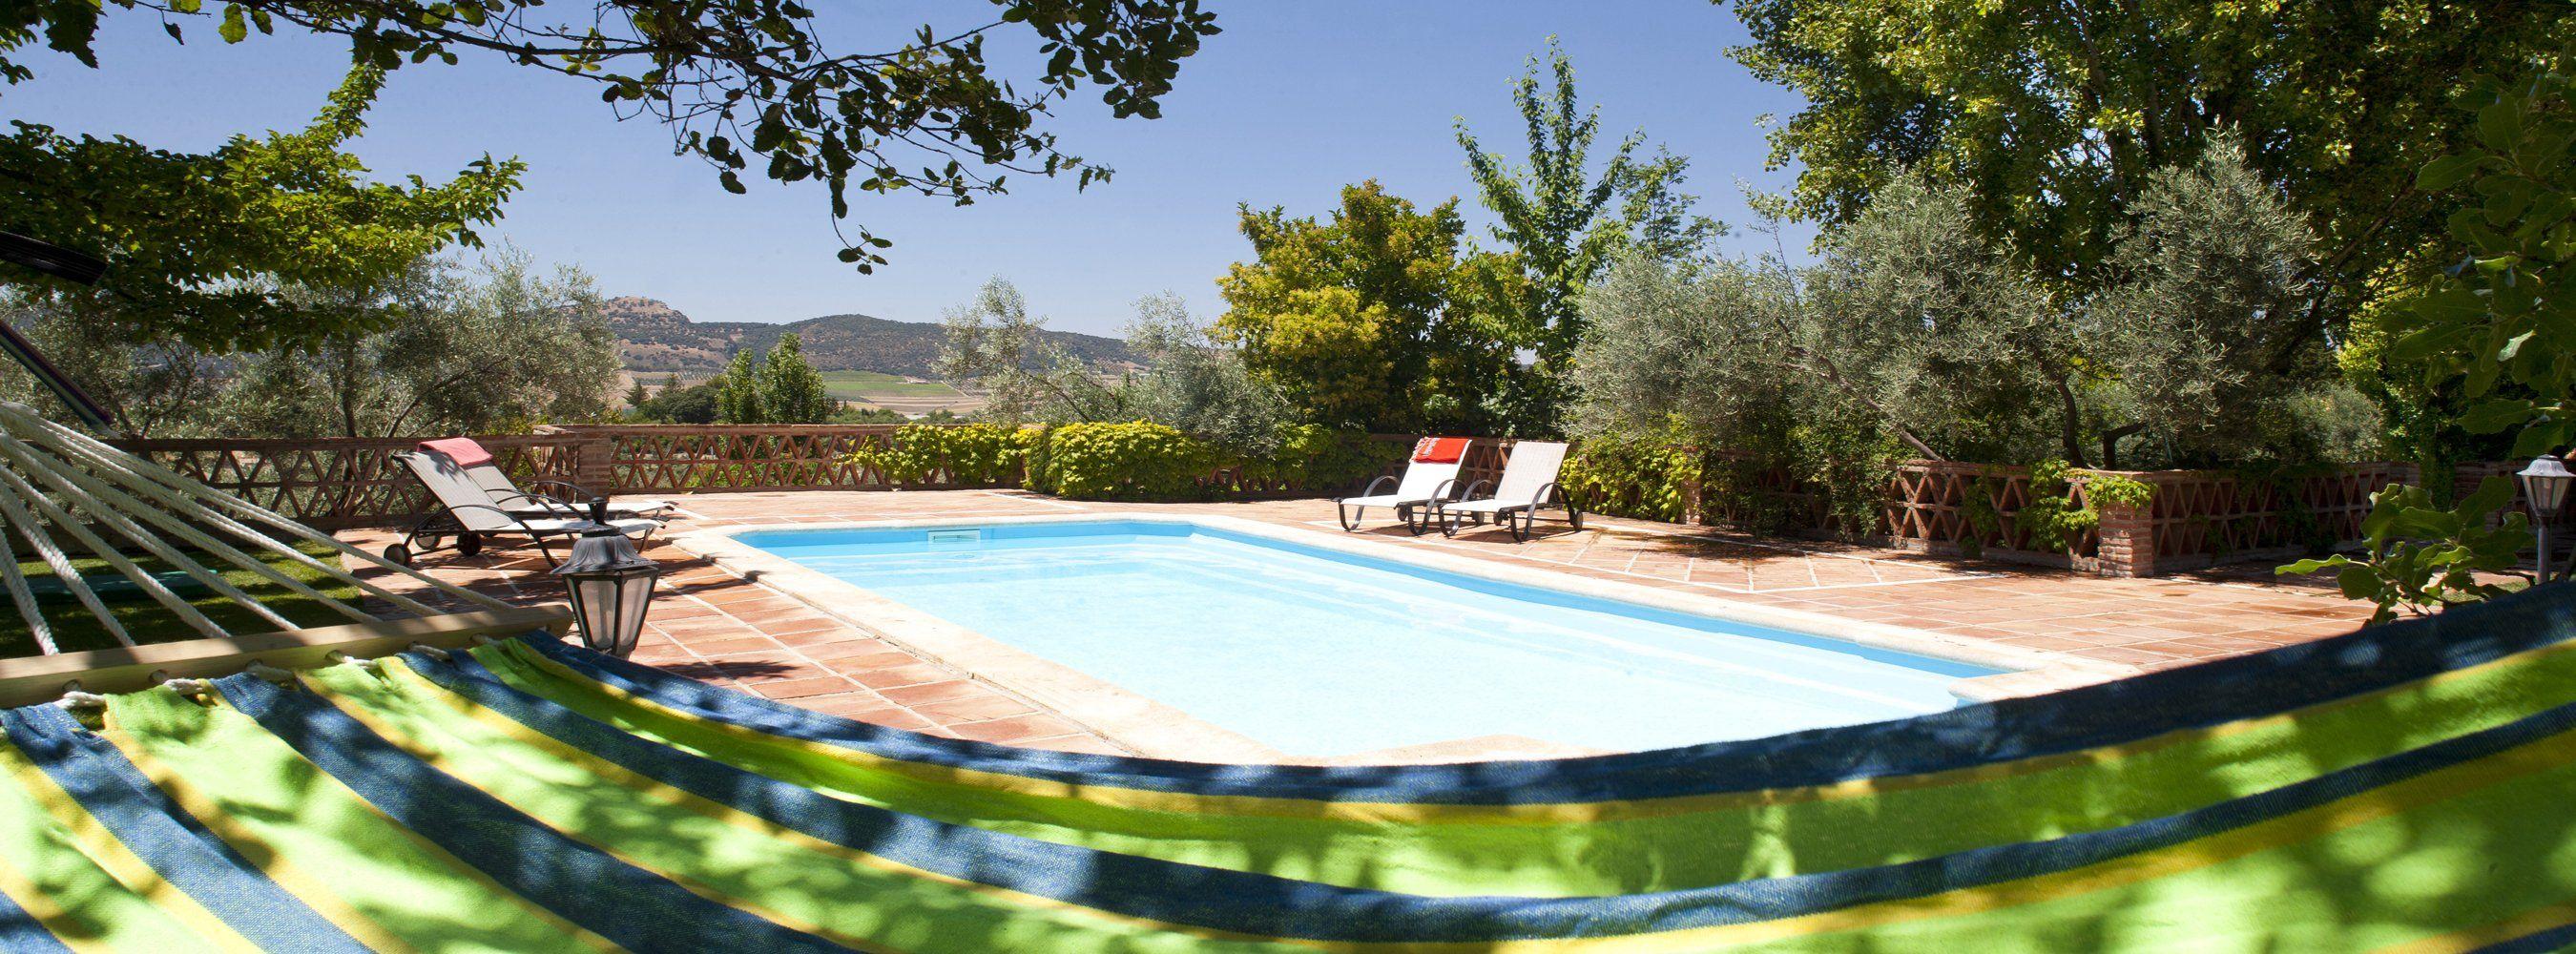 pool and hammock